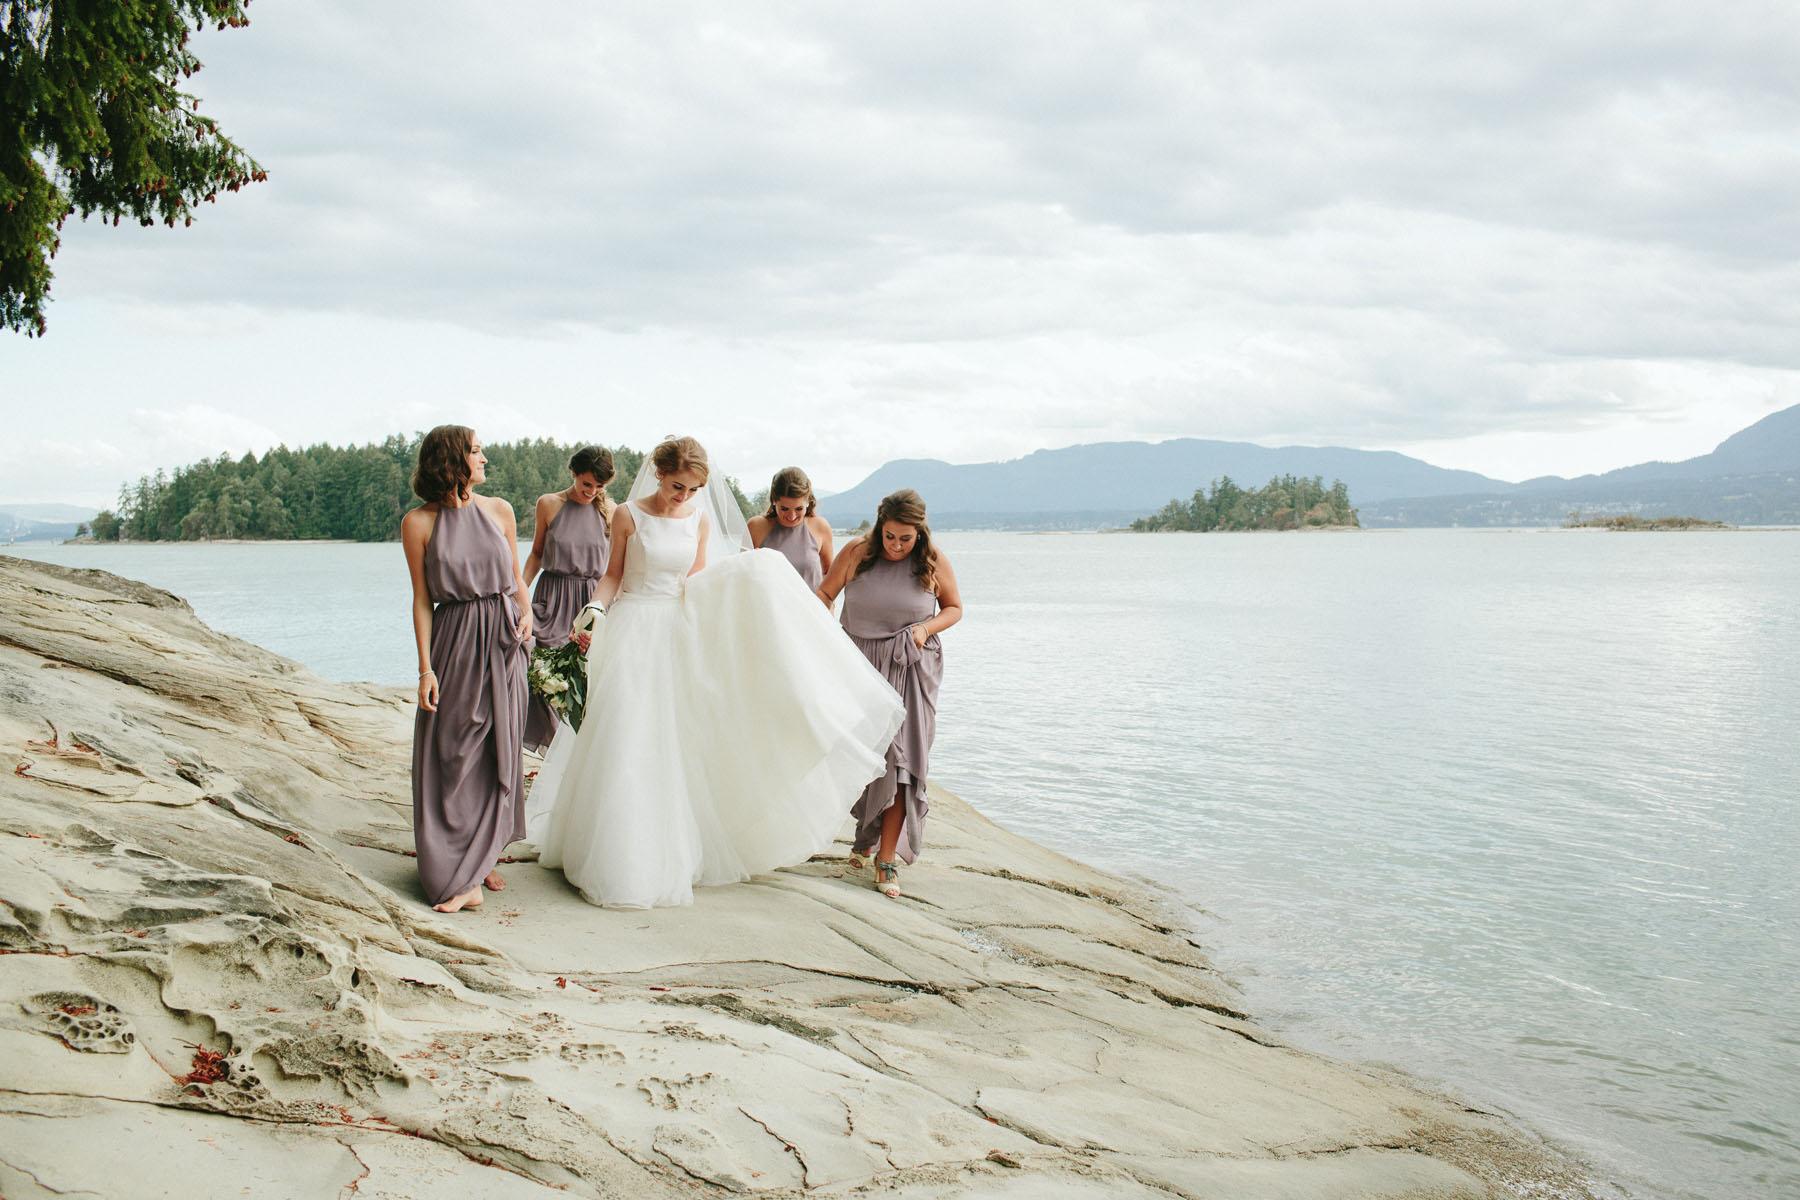 thetis-island-wedding-photographer-rp-rn-114.jpg